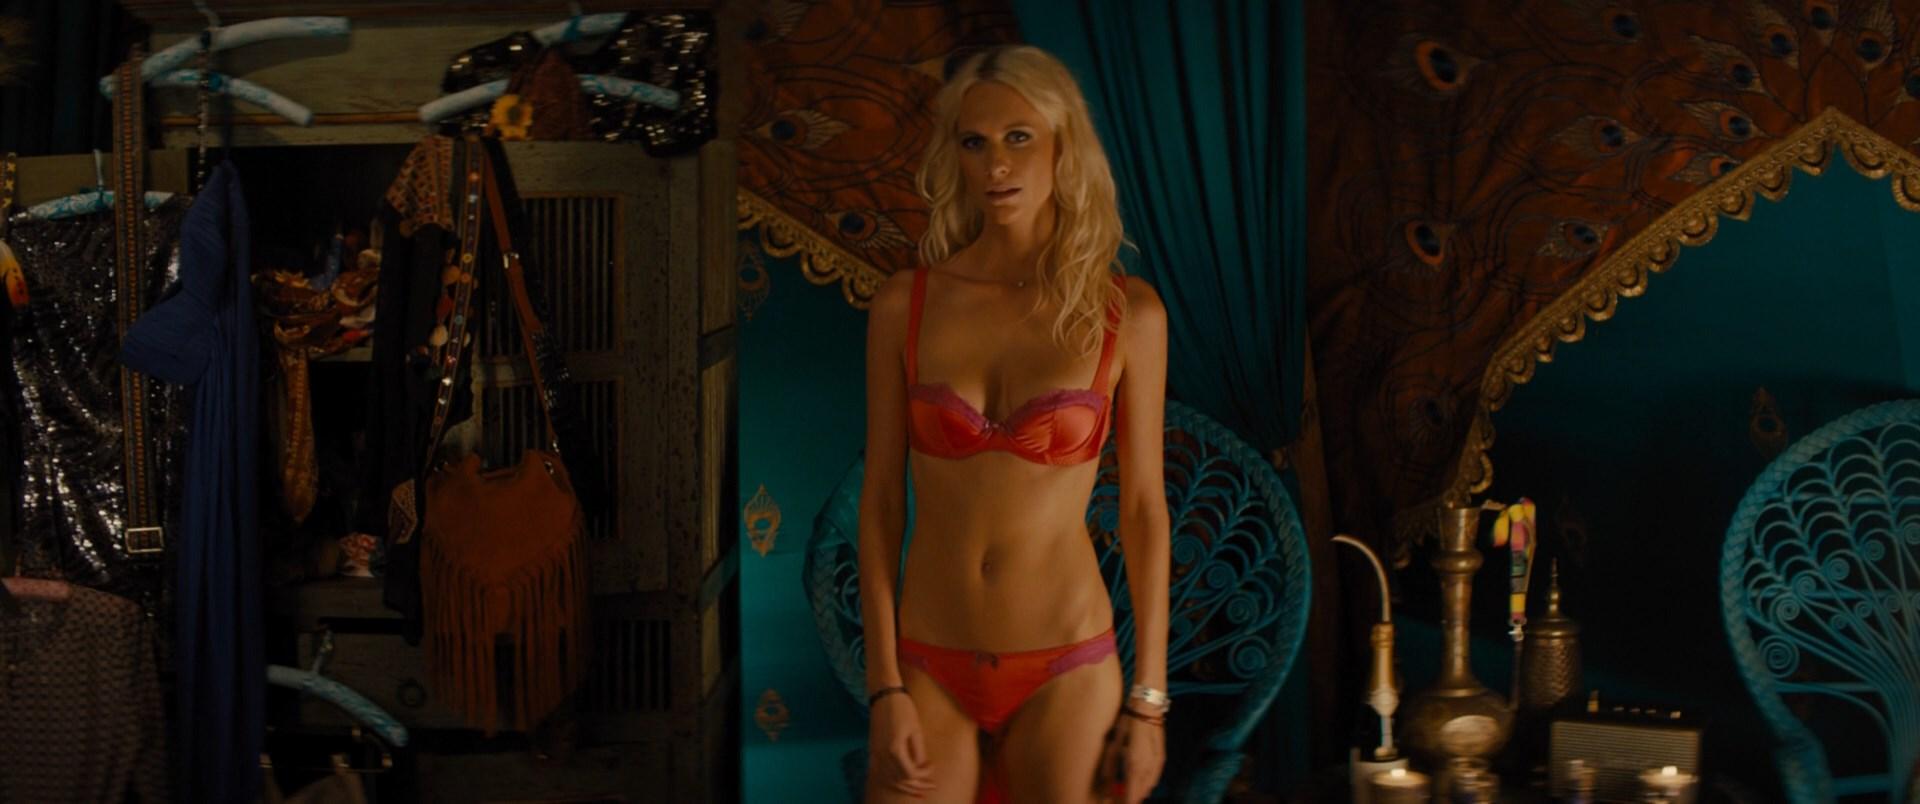 Hanna alstrom kingsman nude